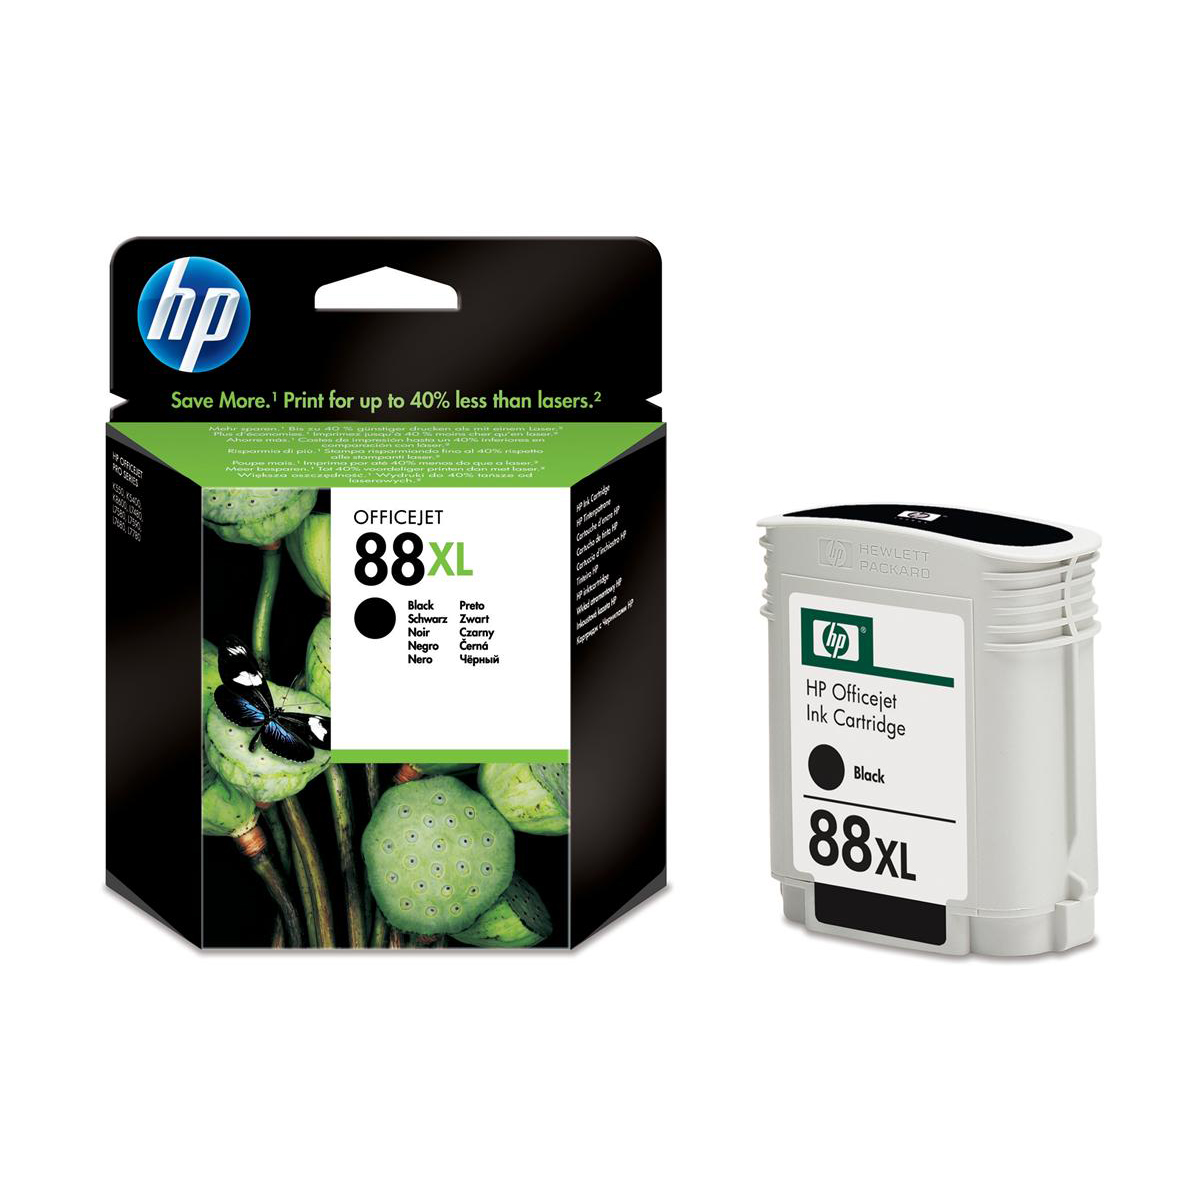 Hewlett Packard [HP] No.88XL Inkjet Cartridge High Yield Page Life 2450pp 58.9ml Black Ref C9396AE